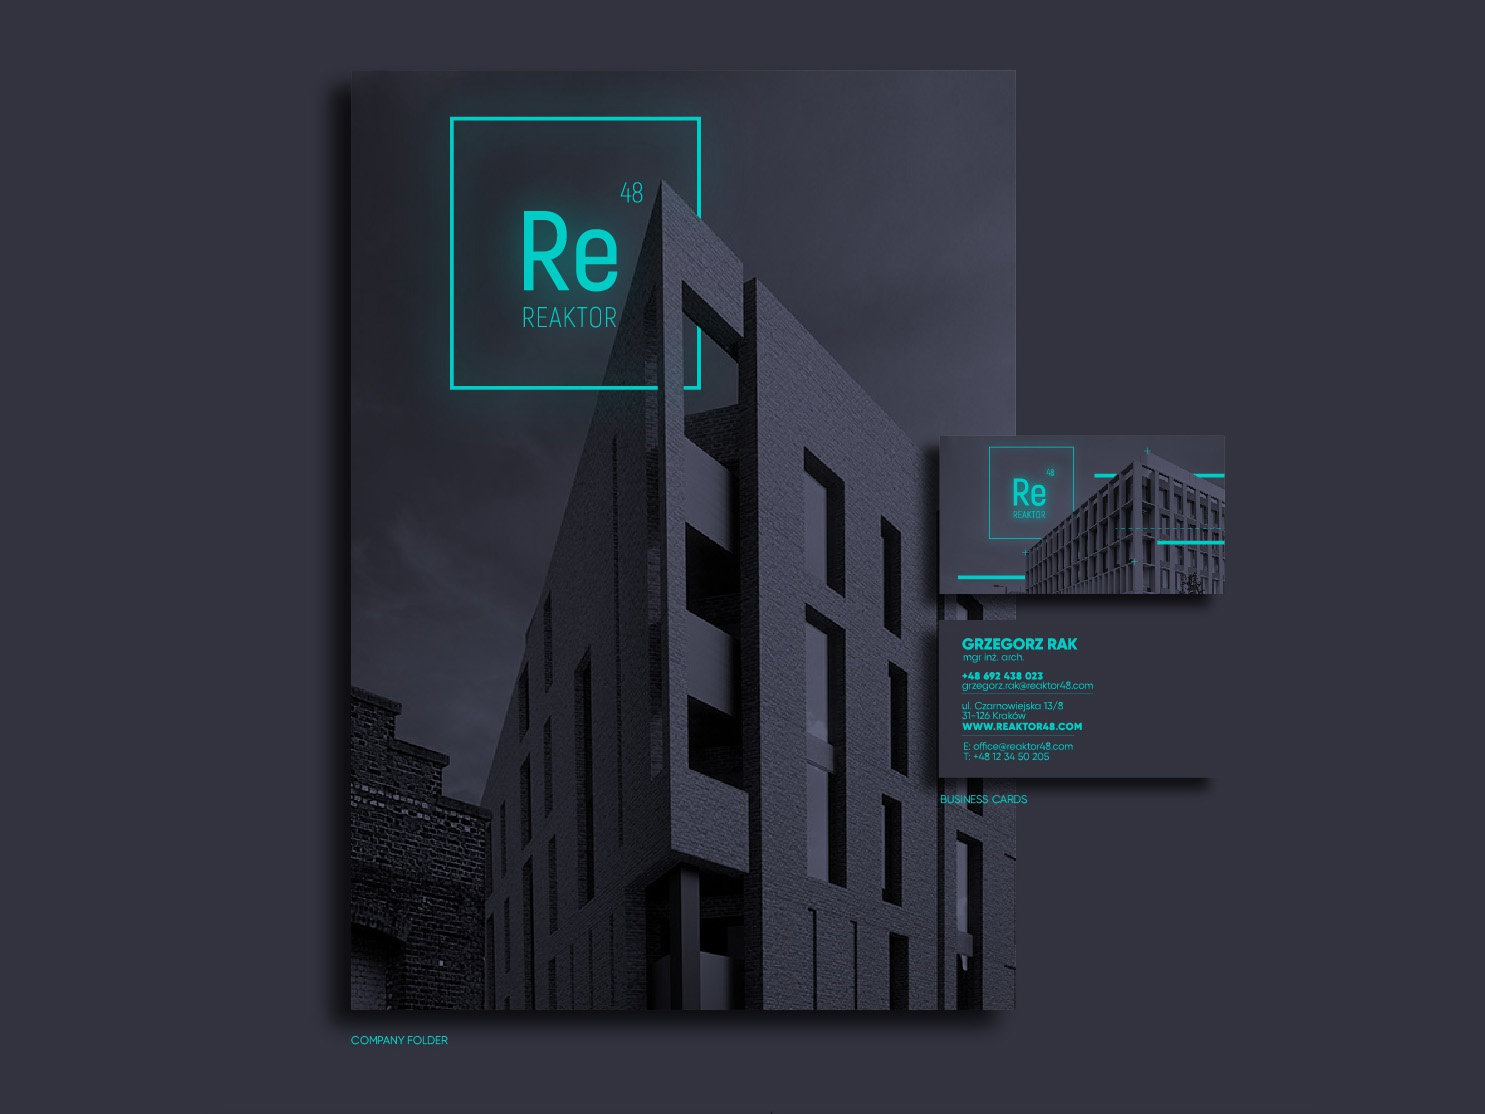 Reaktor48 Rebranding business card 3d graphic modern mockup krakow kraków poland cracow design font typography brand logo architecture illustrator vector ai visual  identity branding